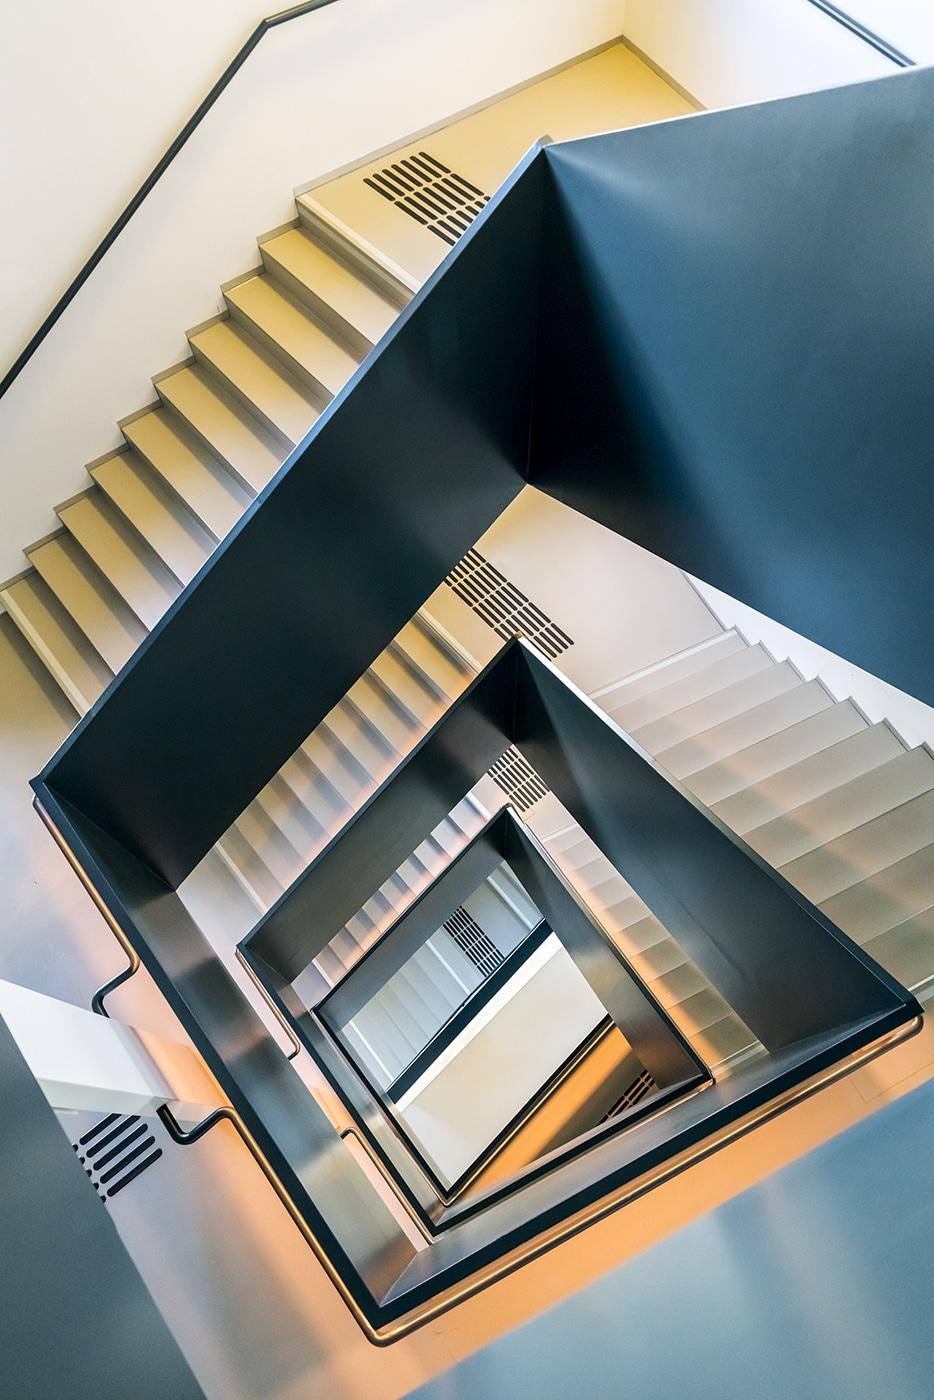 Staircase Photo by Zsolt Hlinka